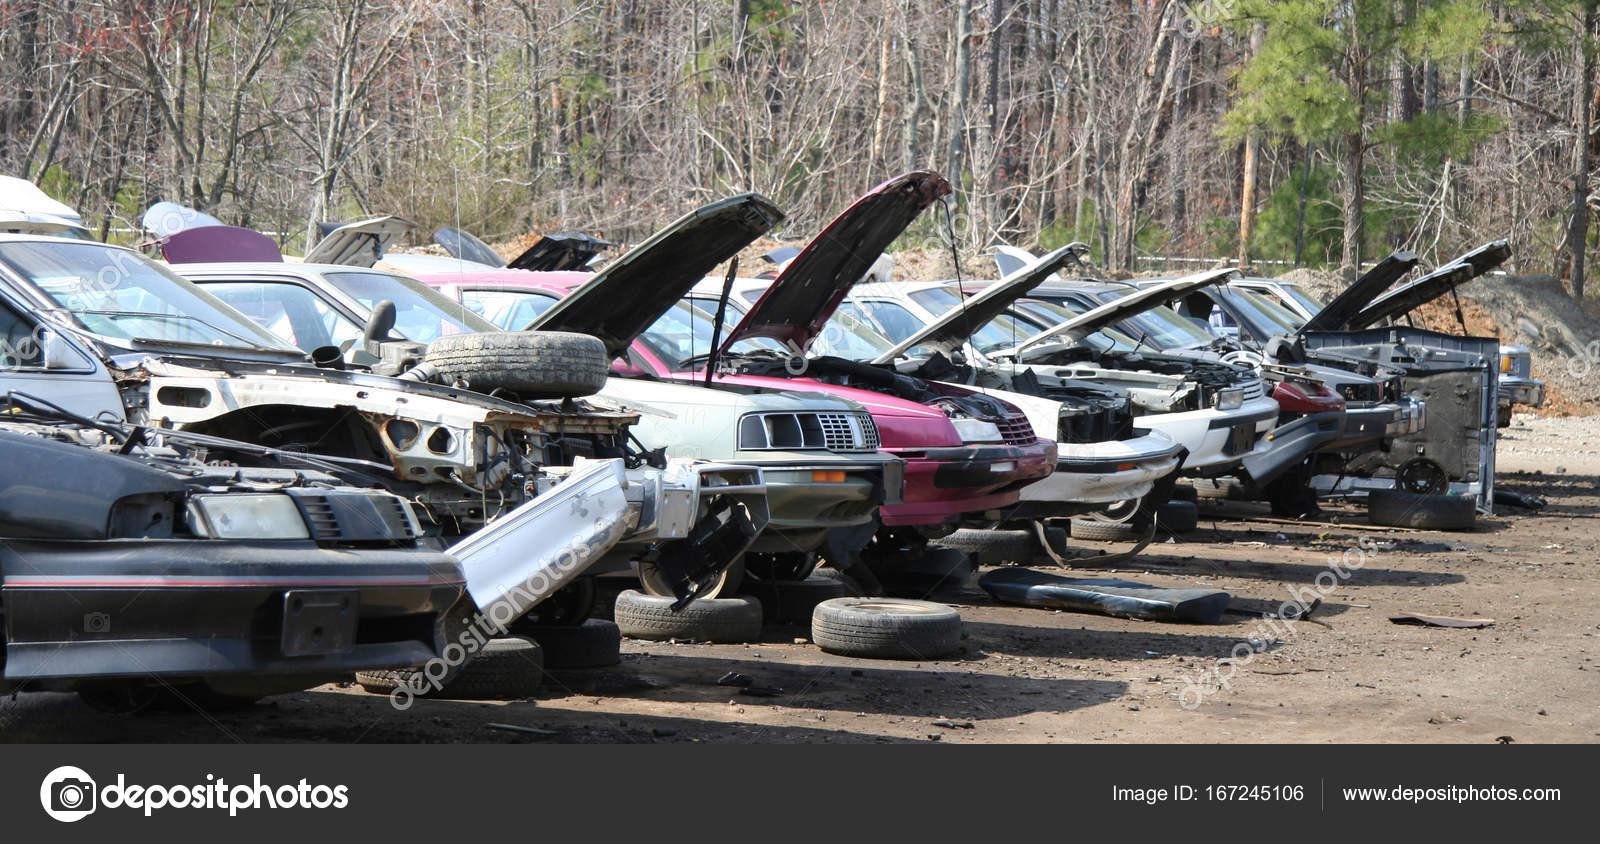 Auto Salvage Yard — Stock Photo © ErrantPixels #167245106